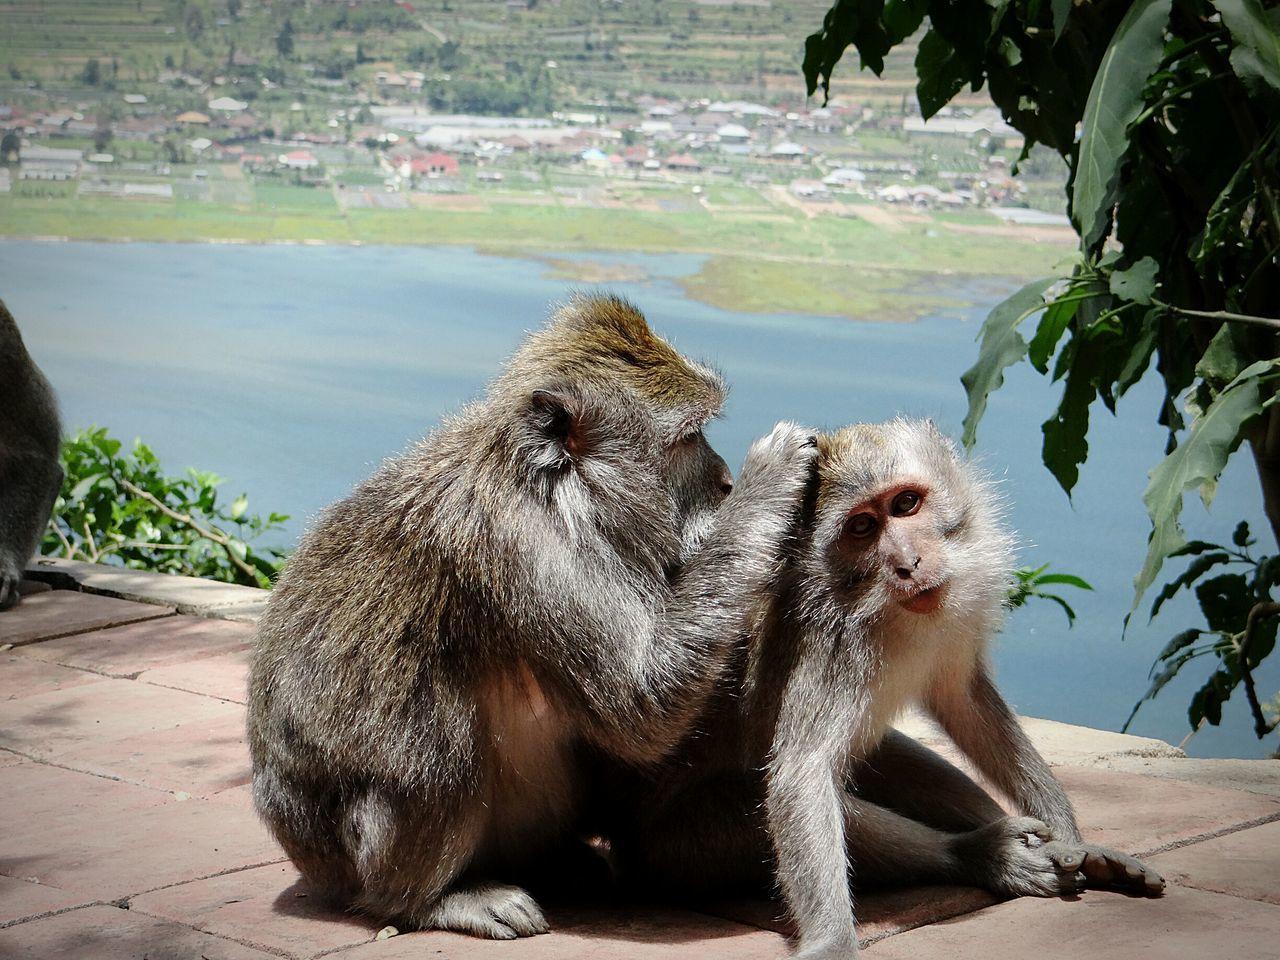 monkeys Bali, Indonesia Animals Wildlife Monkeys Bali Landschaft Landscape Nature Affen Monkey Beauty In Nature Buyan Lake Bratan Lake Pura Ulun Danu Bratan Temple Affen Lausen Sich Delouse Lausen